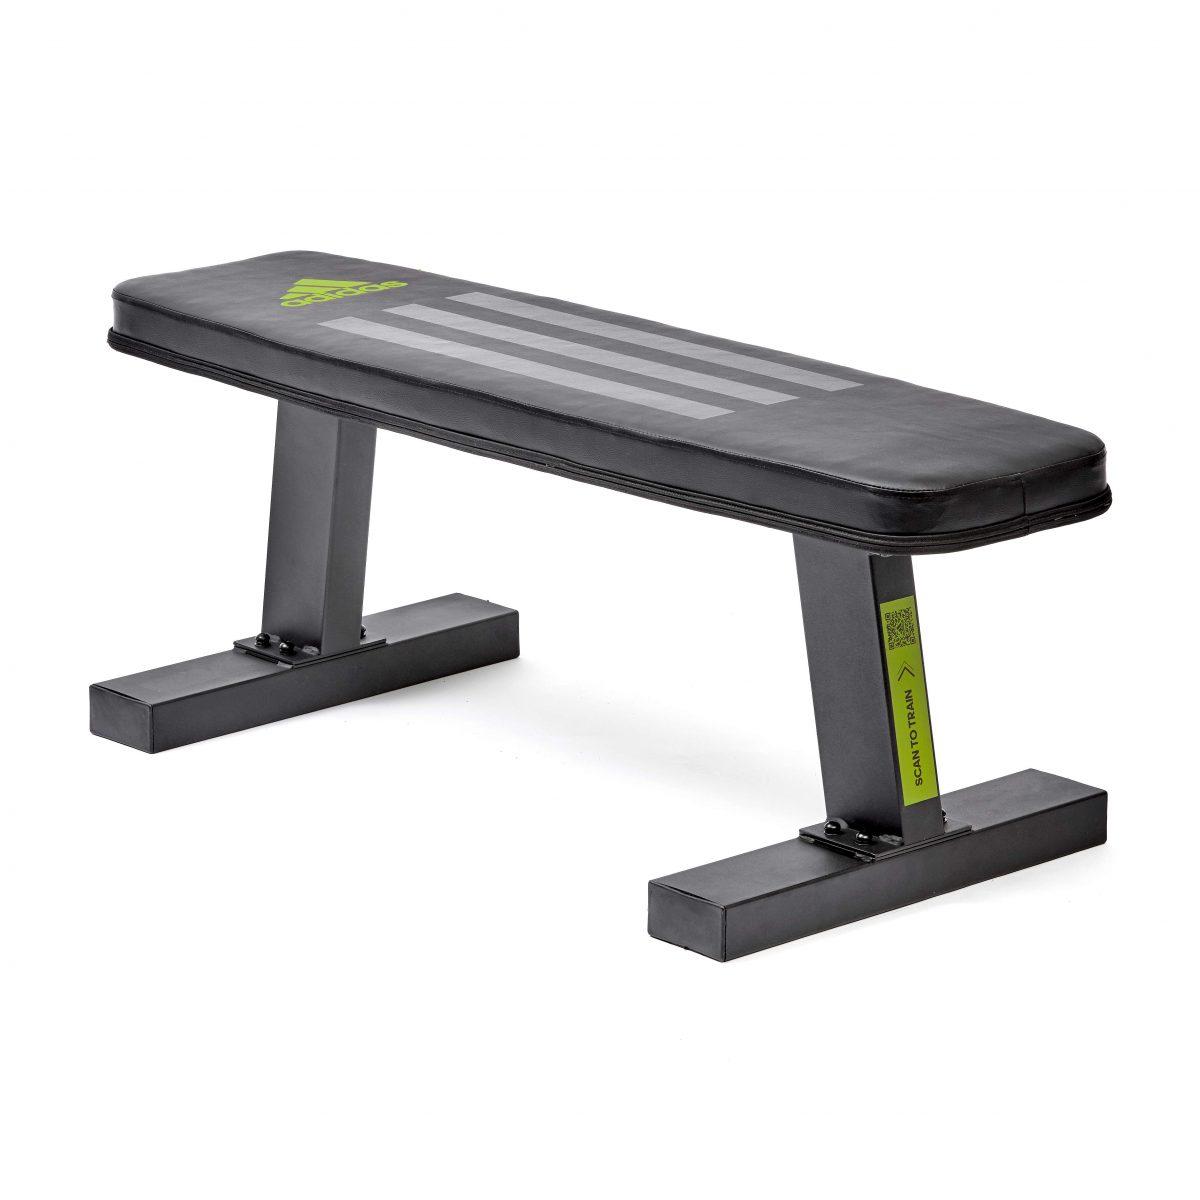 "Adidas Flachbank ""Performance Flat Bench"" - Fitnessgeräte - Adidas"